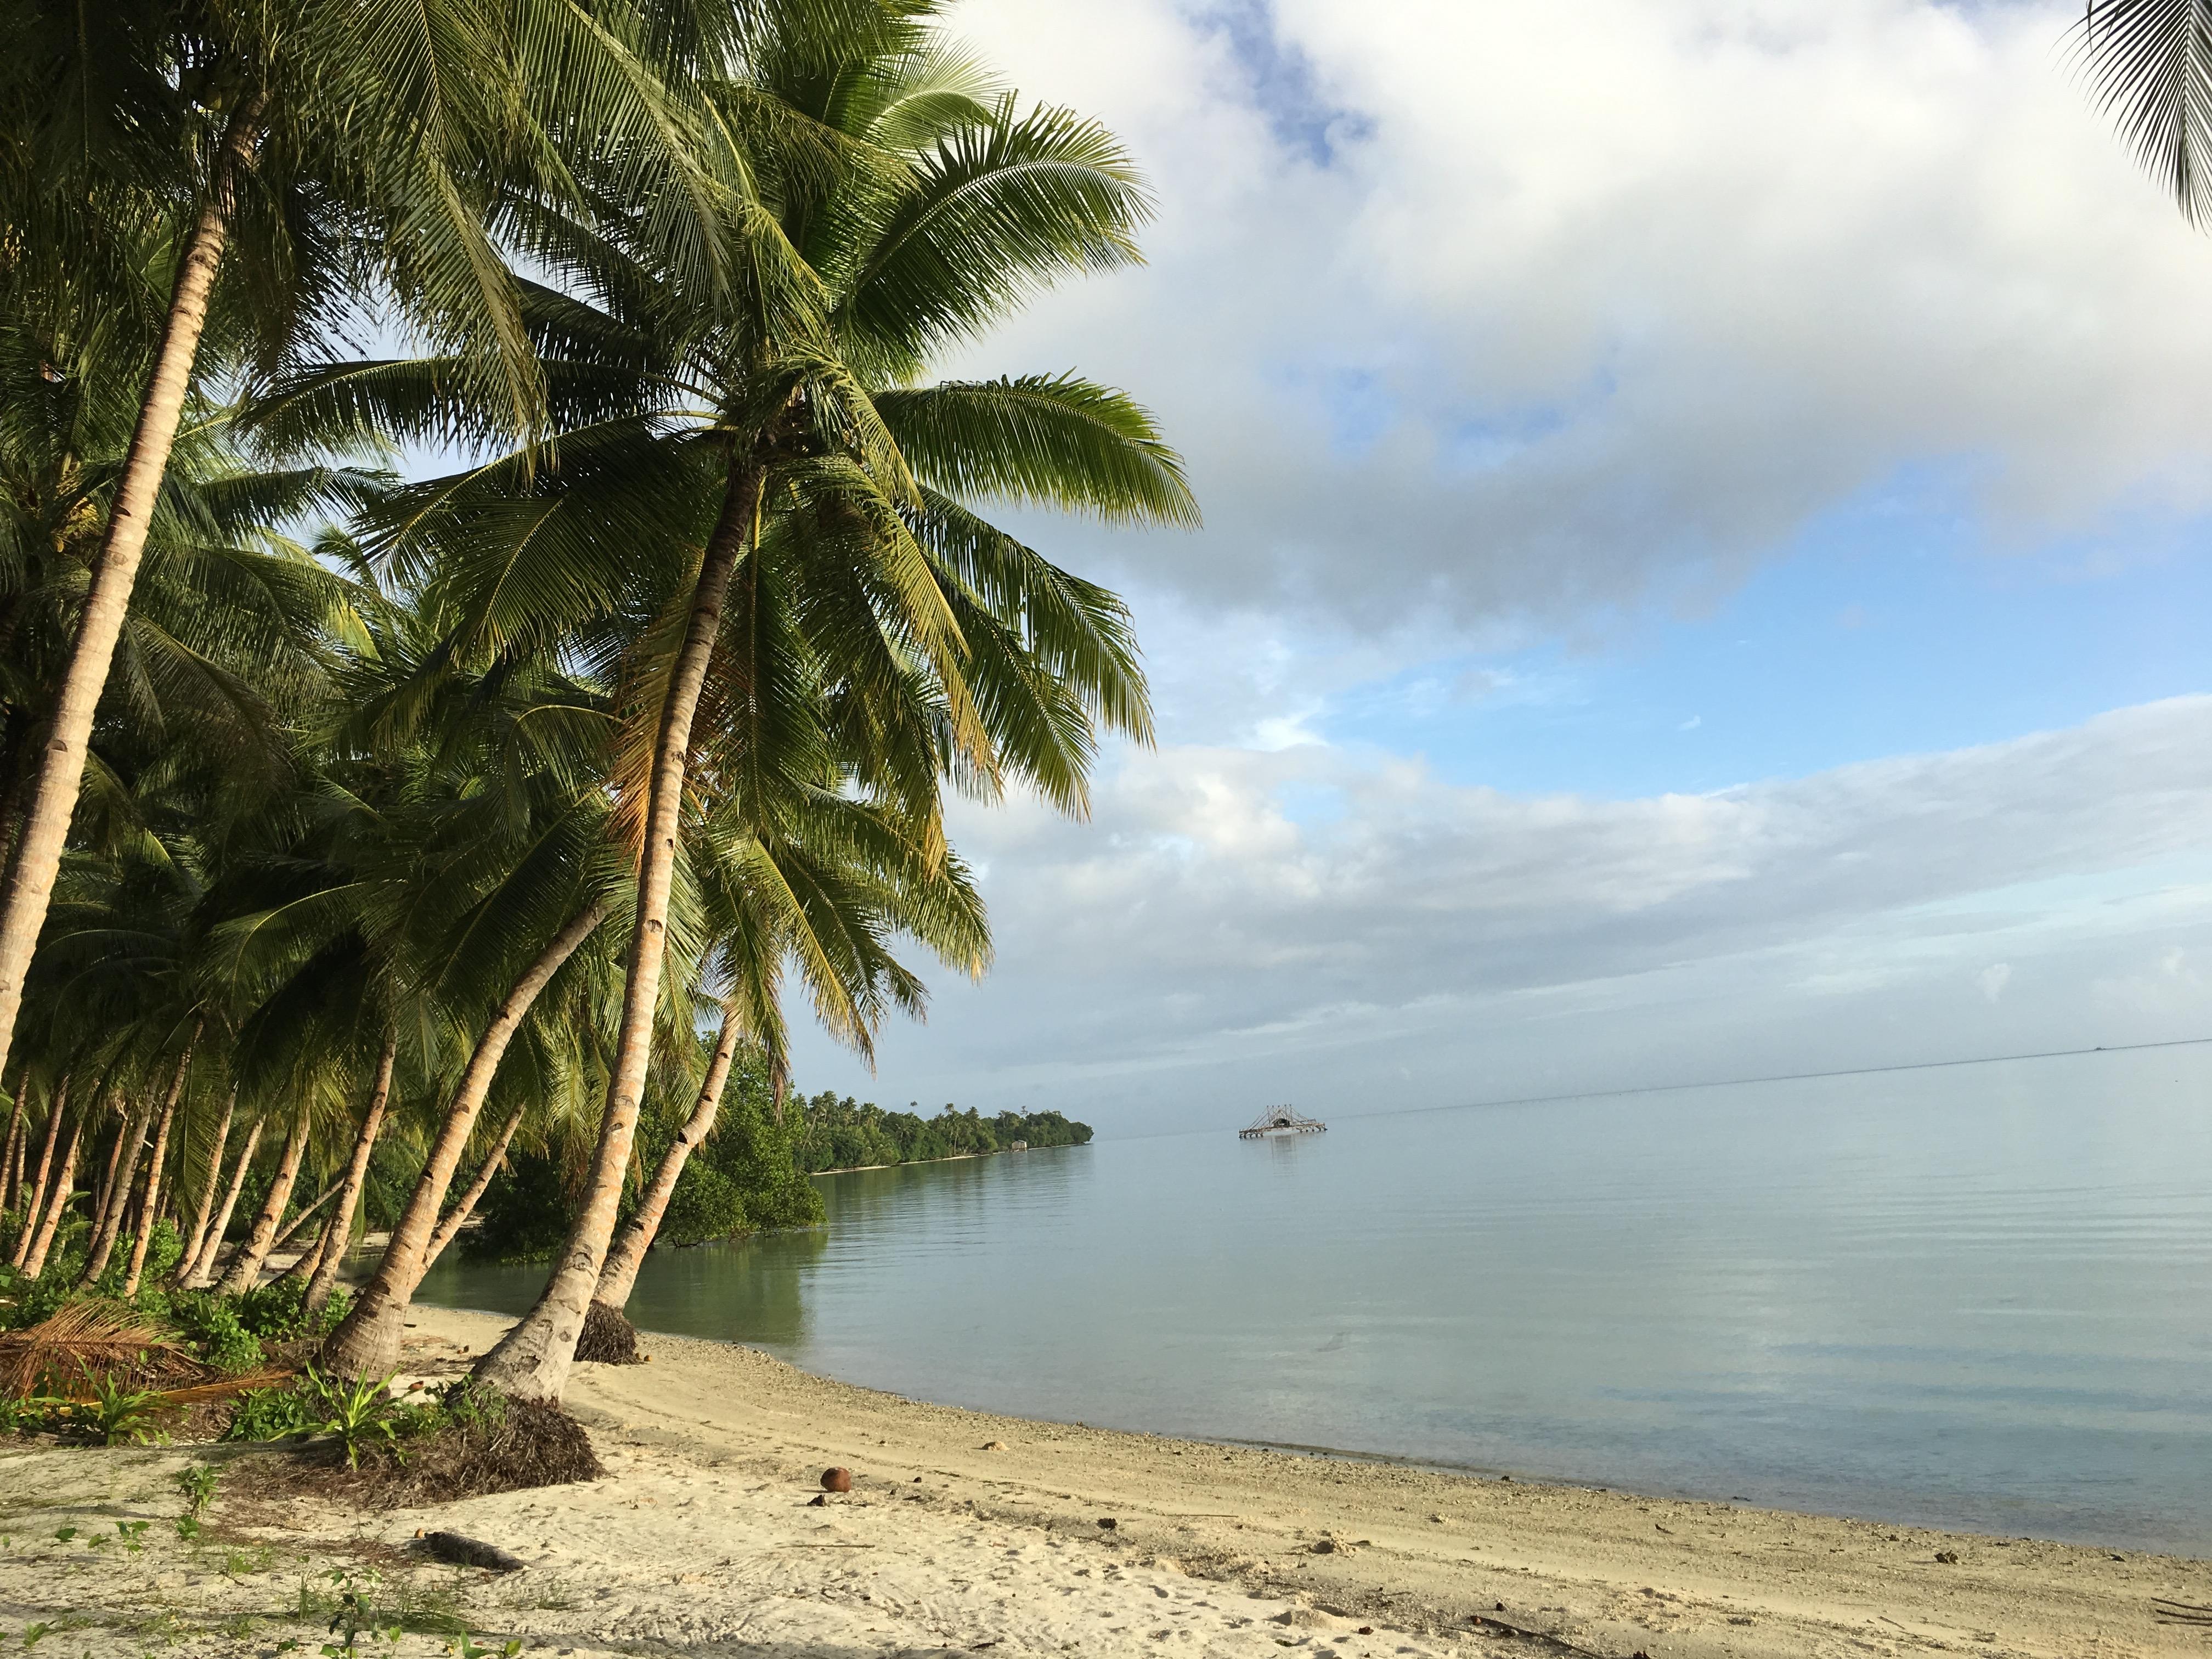 Kei Kecil Island